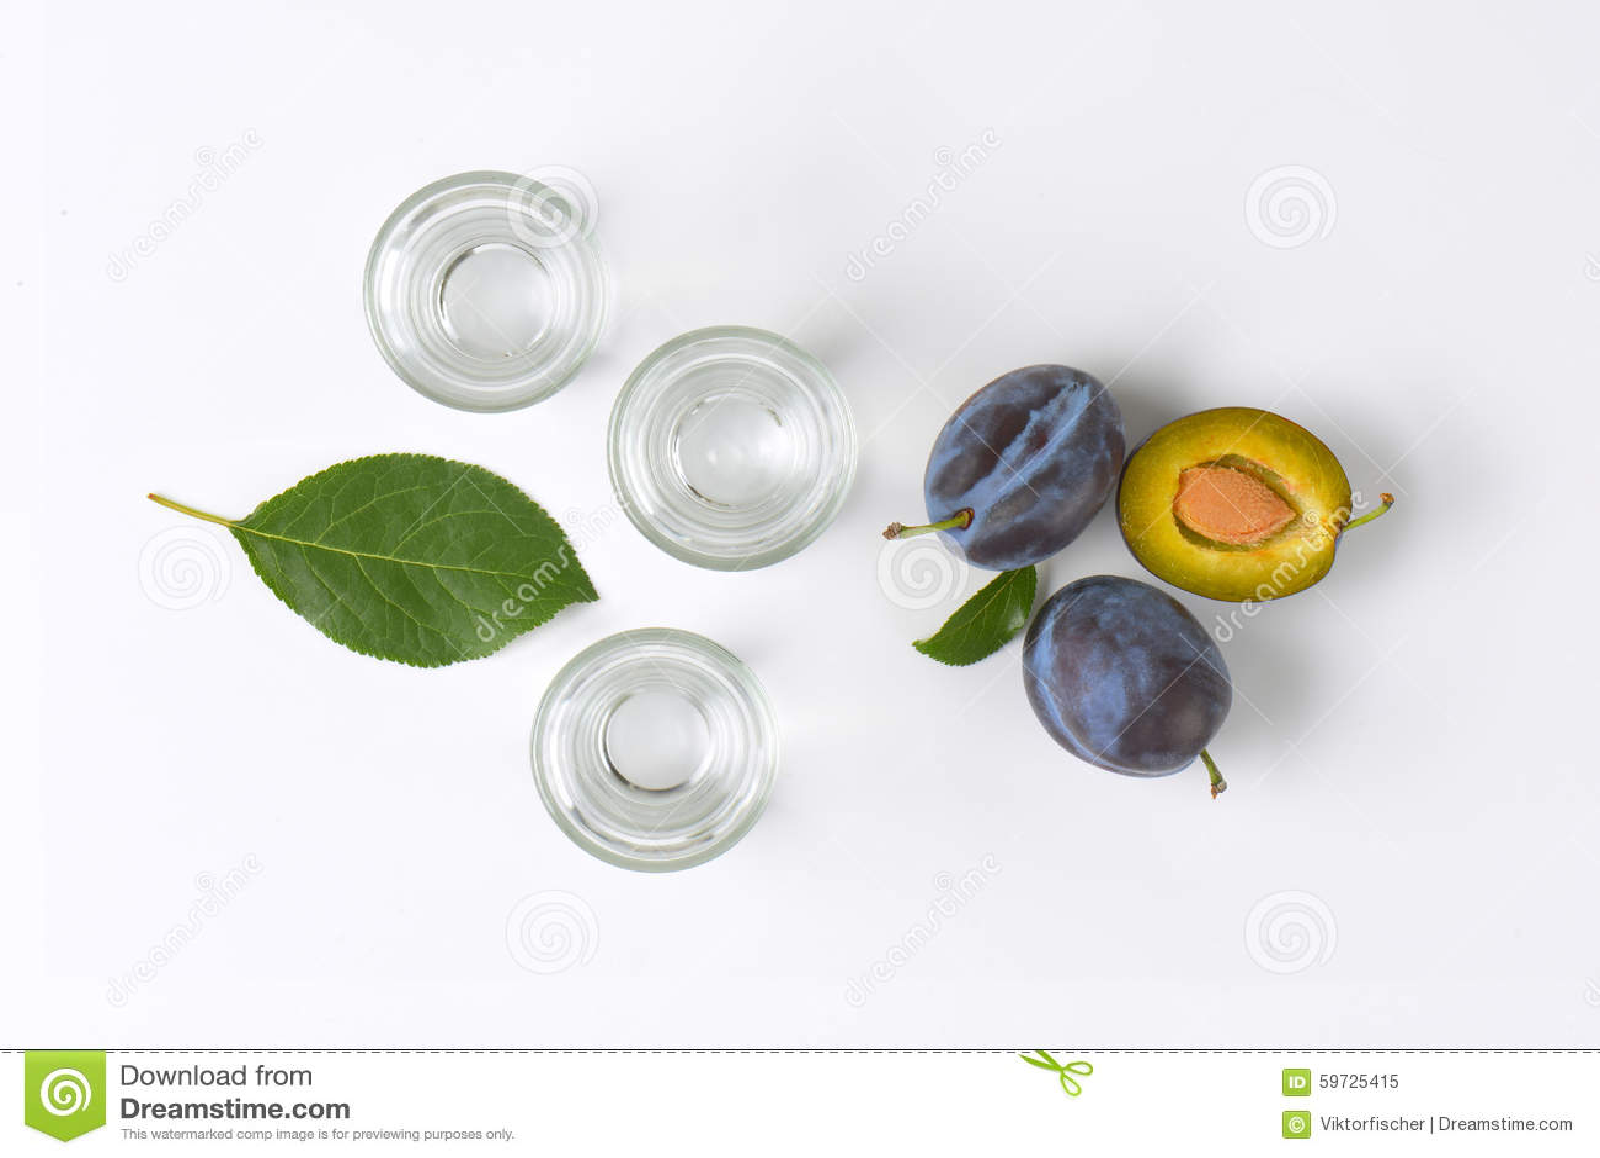 Slivovitz and plums